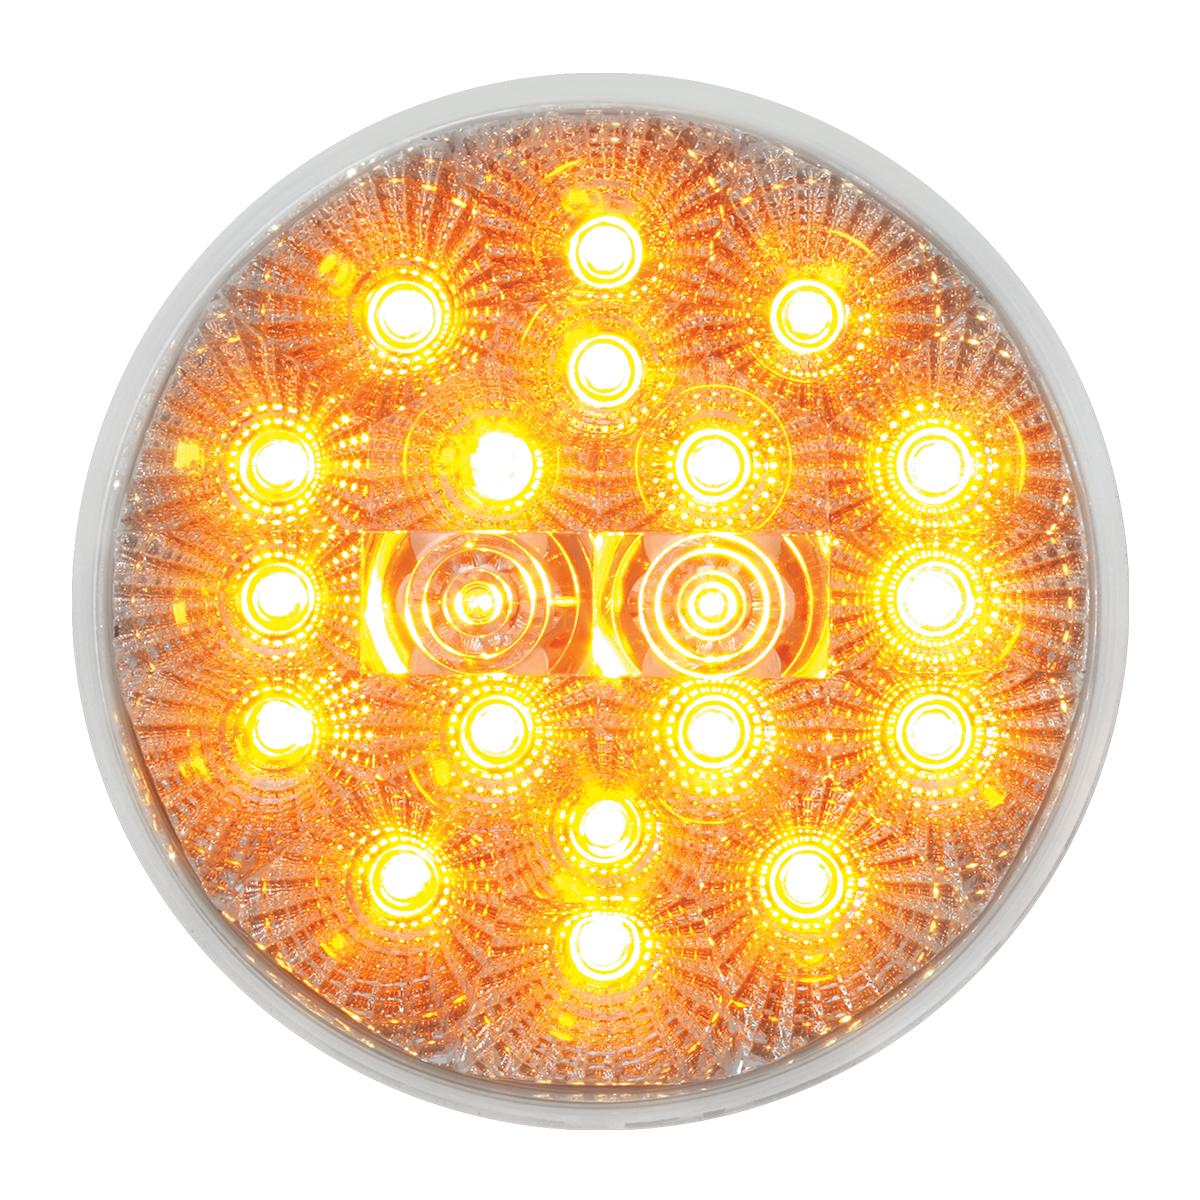 "77091 4"" Spyder LED Light in Amber/Clear"